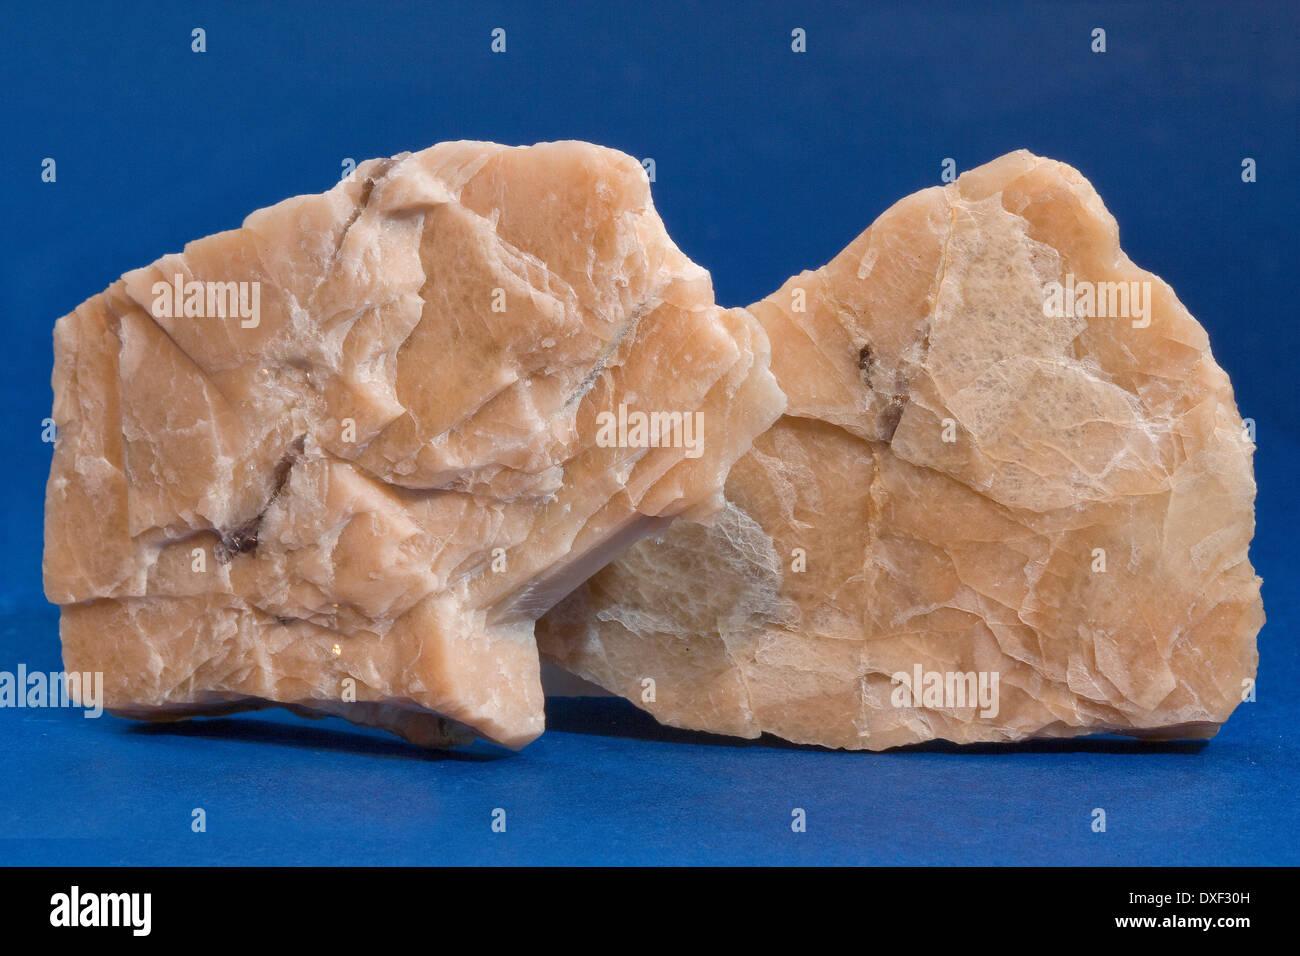 geological samples of orthoclase feldspar. - Stock Image